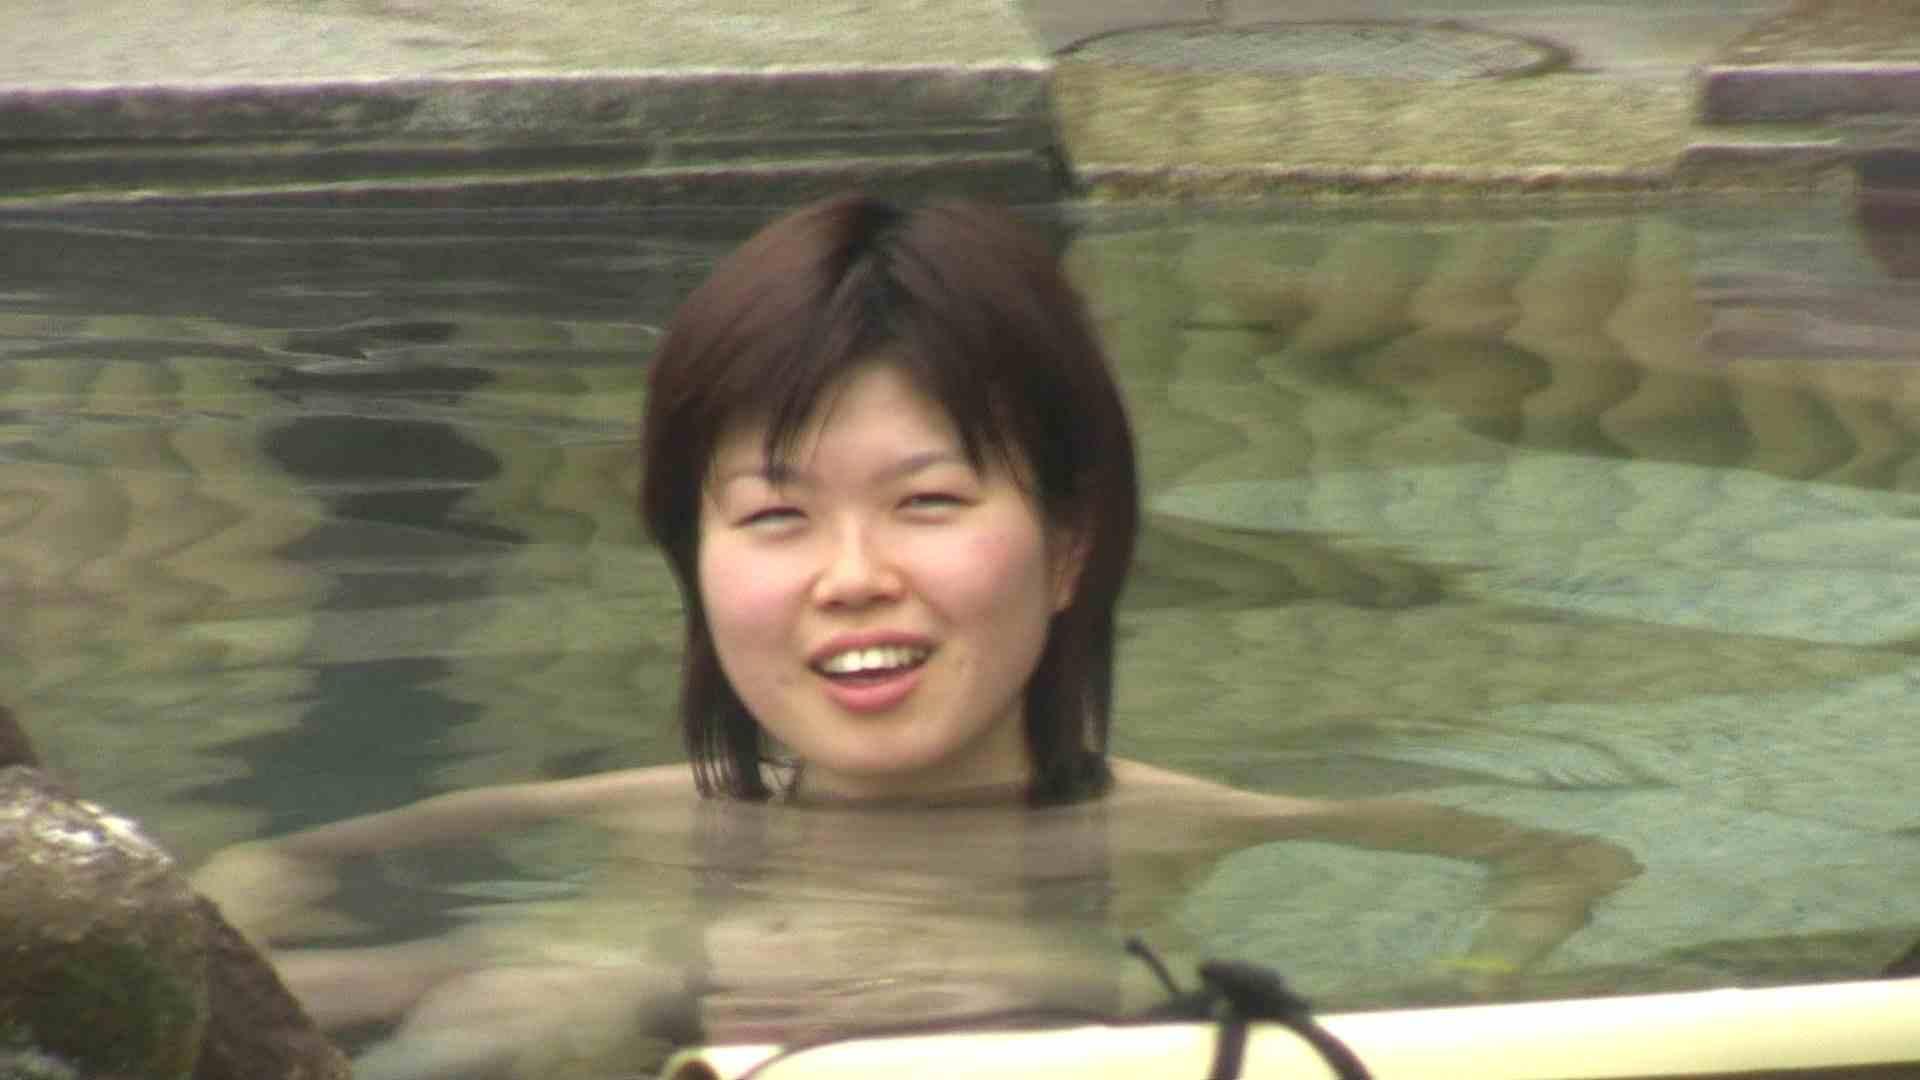 Aquaな露天風呂Vol.675 0  44連発 12